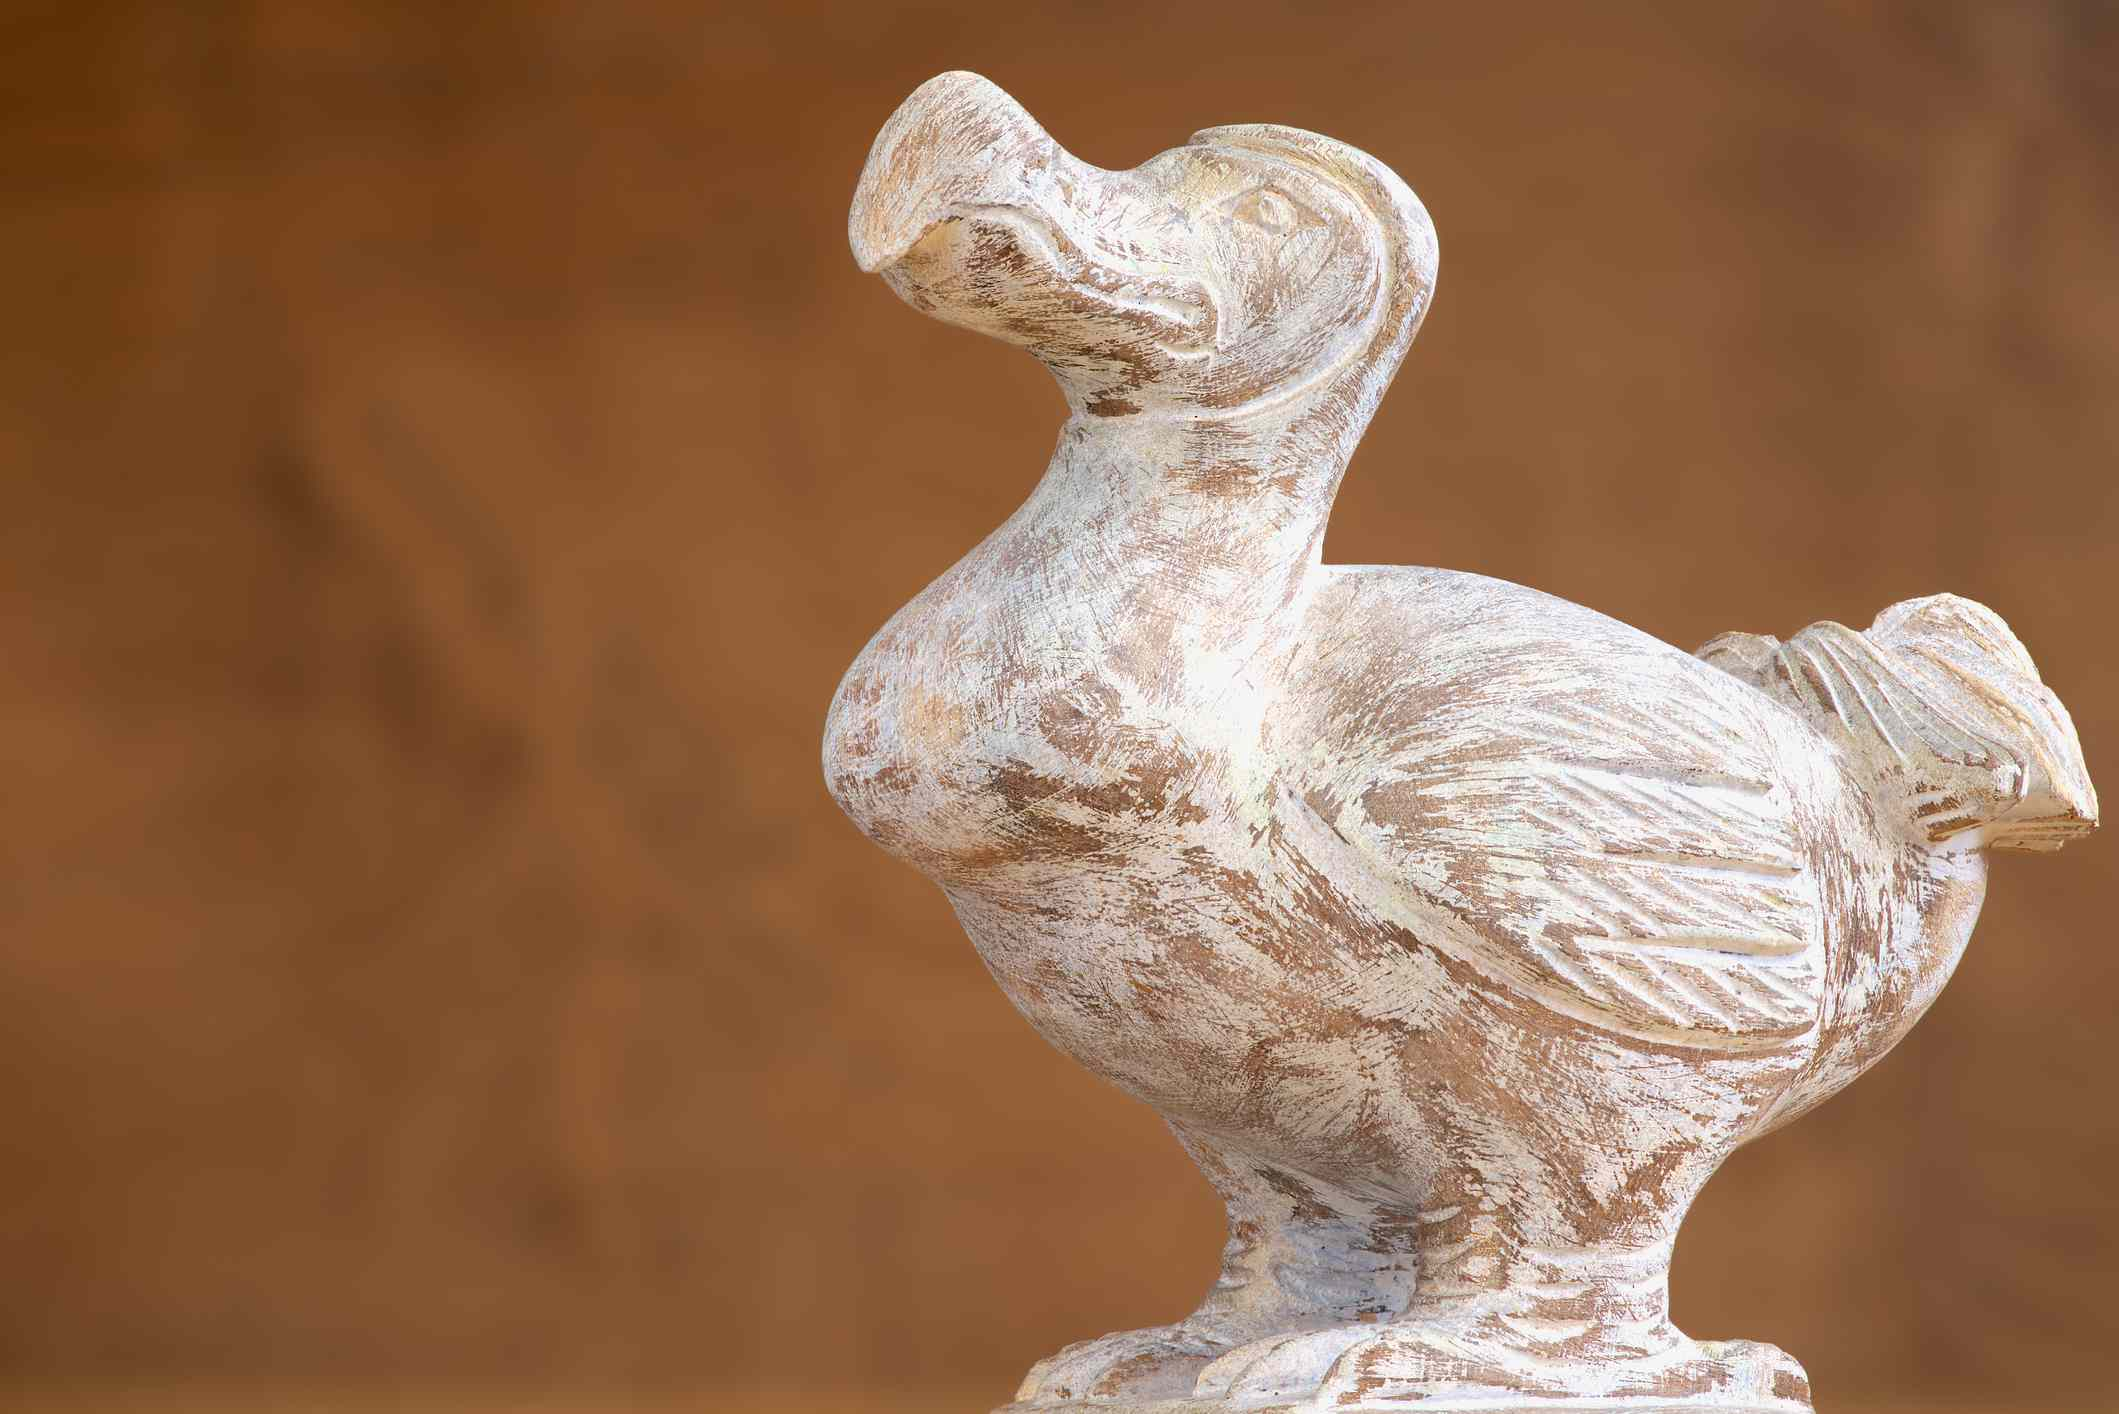 Wooden Dodo bird, typical souvenir from the island of Mauritius.